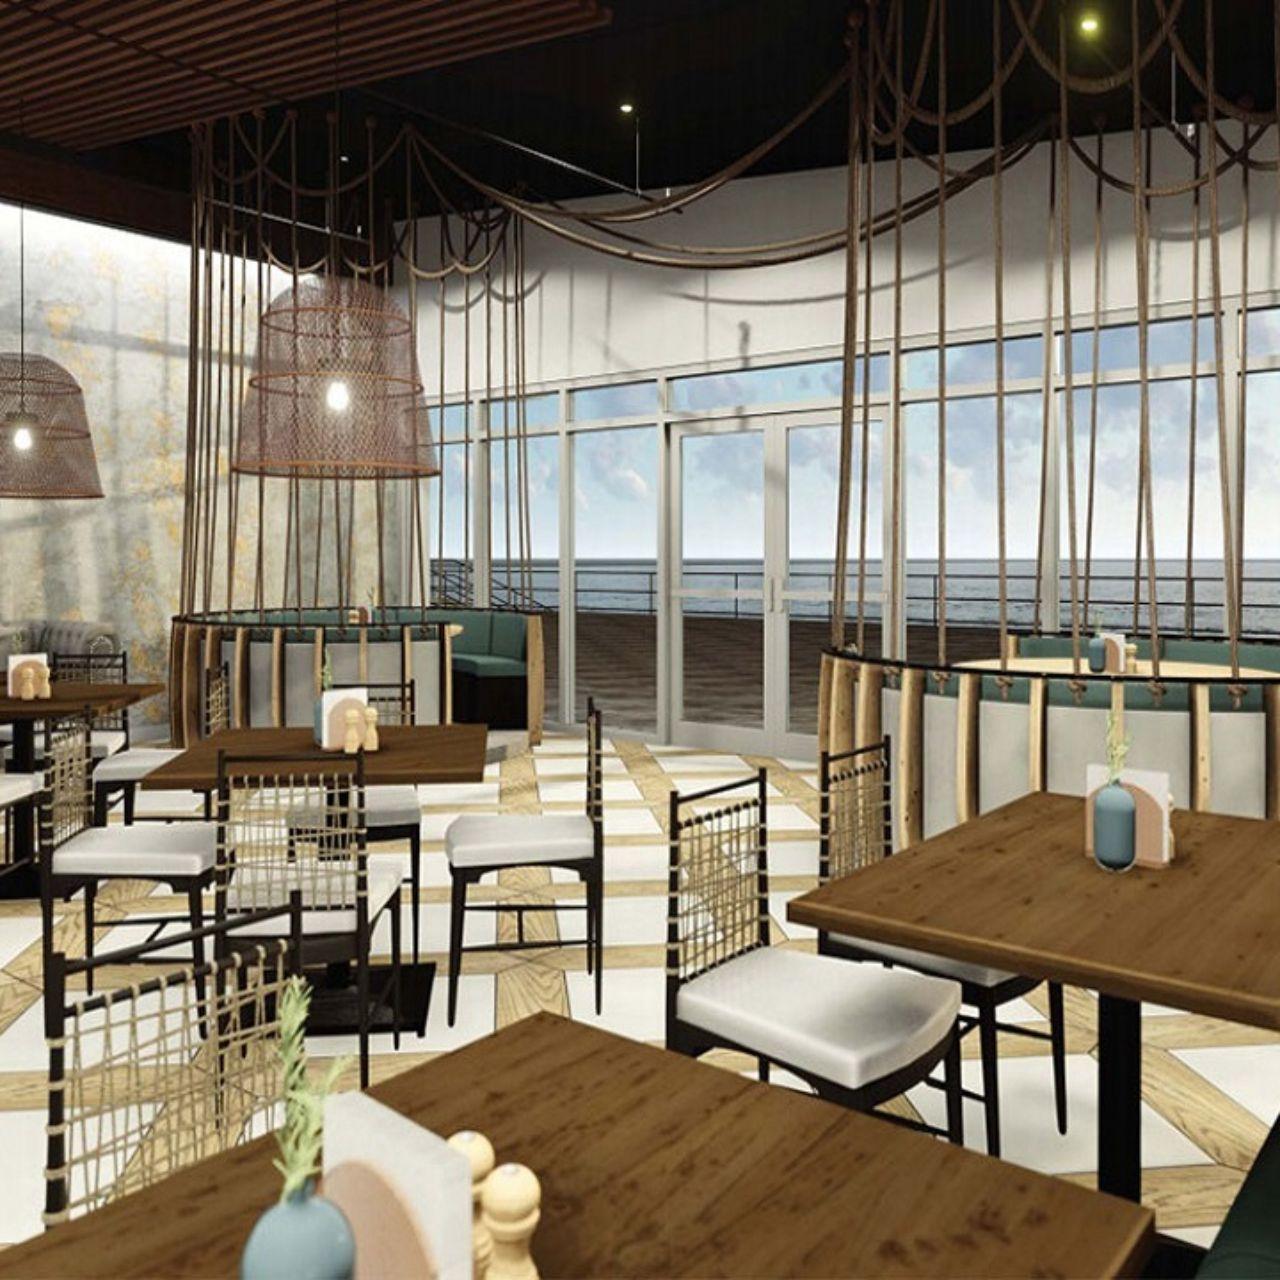 Iron Whale Restaurant - Asbury Park, NJ | OpenTable